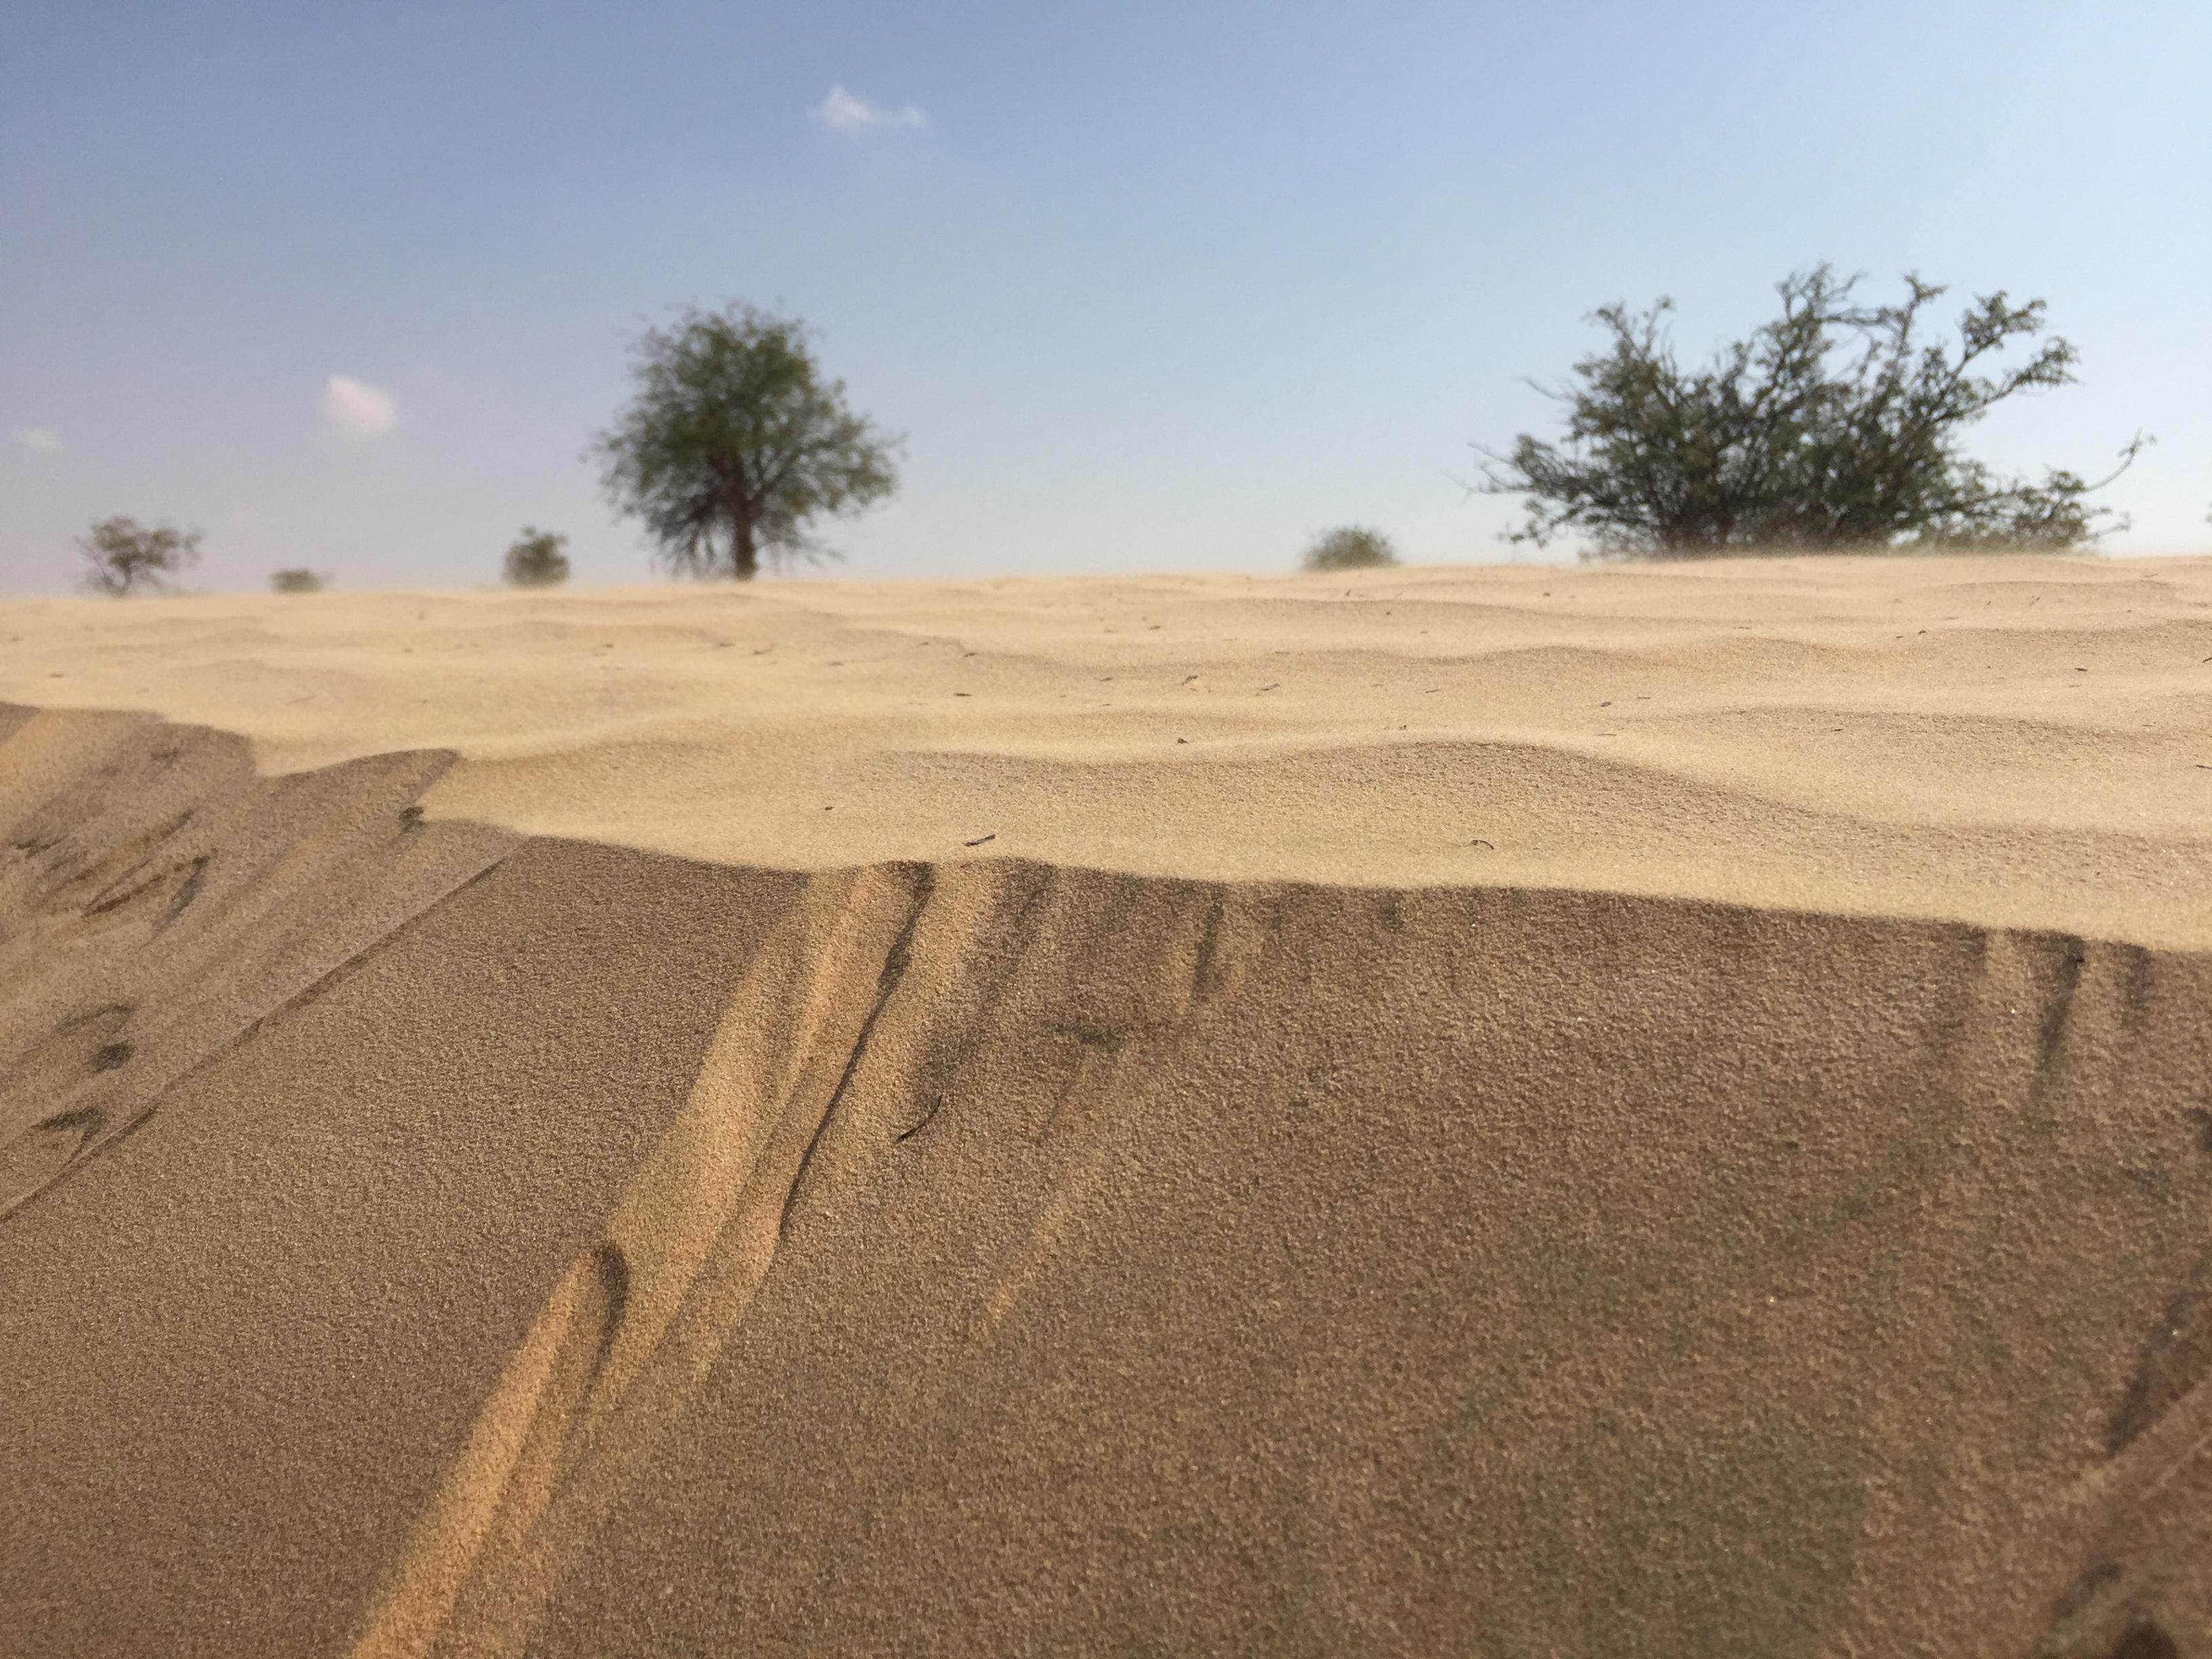 Zand in Oman. Zand. In. Oman. Wie had dat gedacht?